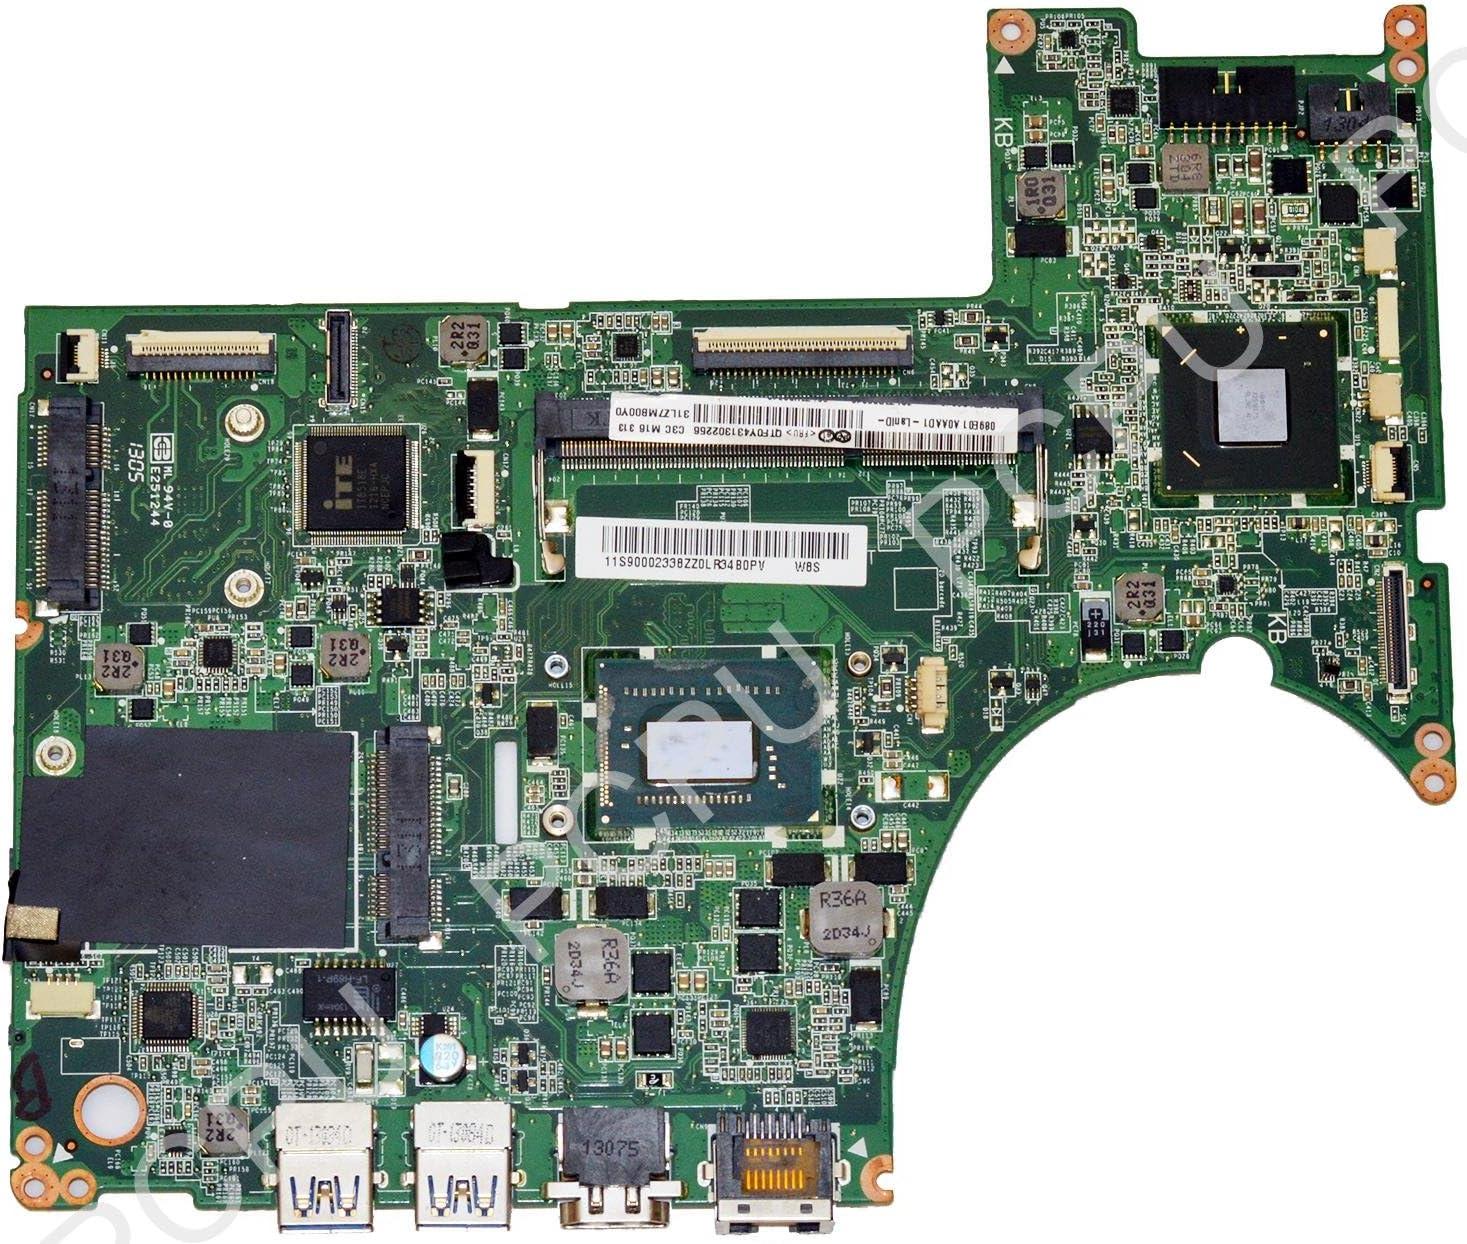 90002338 Lenovo U310 Laptop Motherboard w/Intel i3-3227u 1.9Ghz CPU